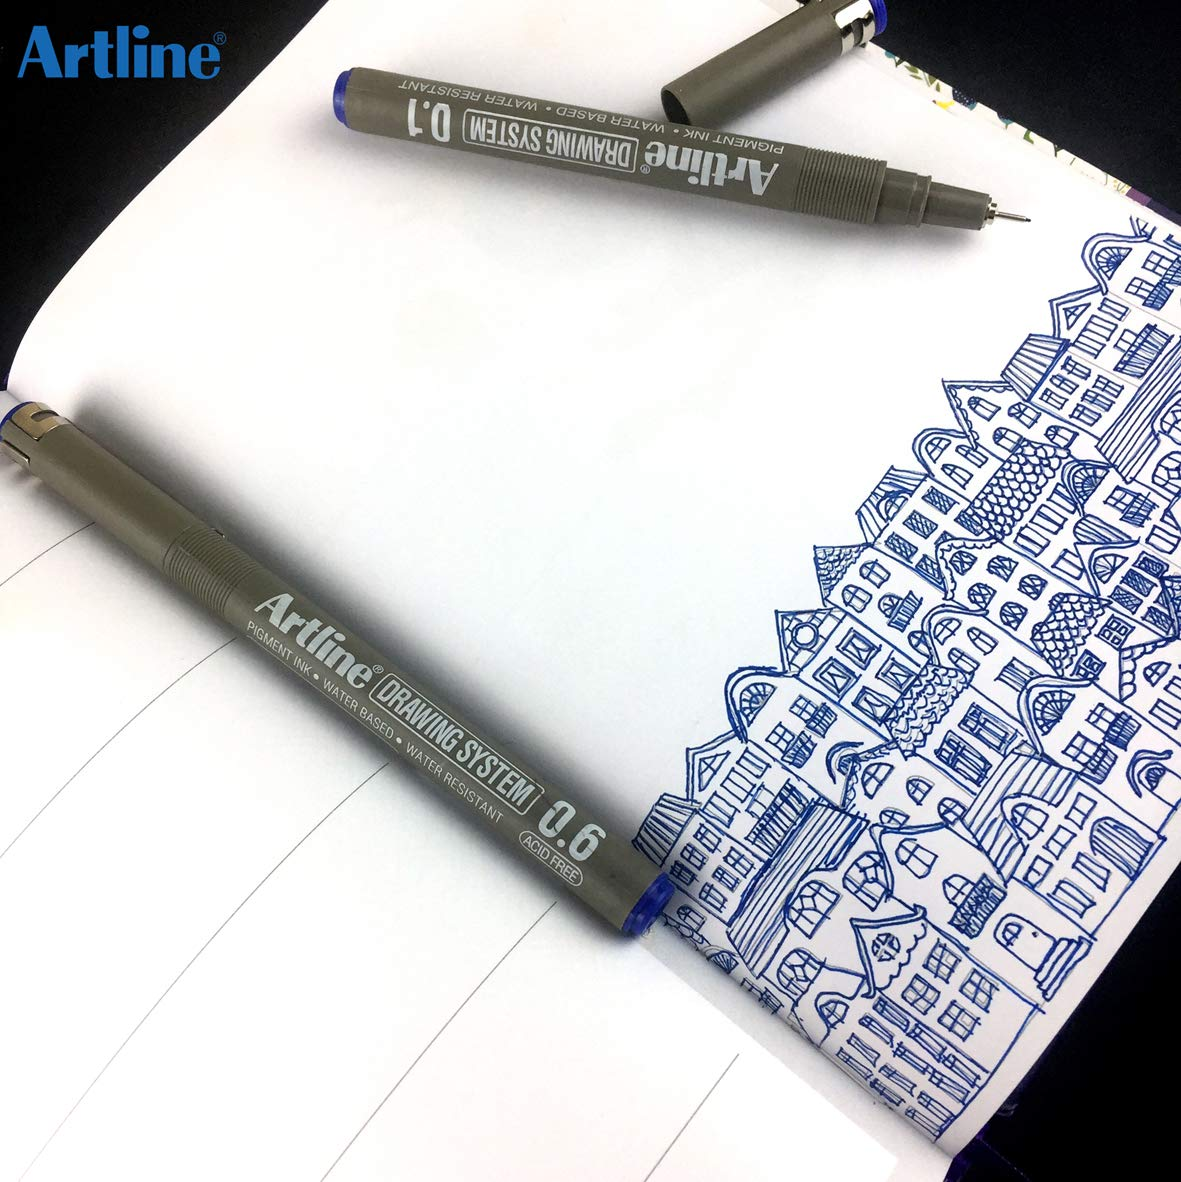 ARTLINE DRAWING PENNA PUNTA 0.1 NERO